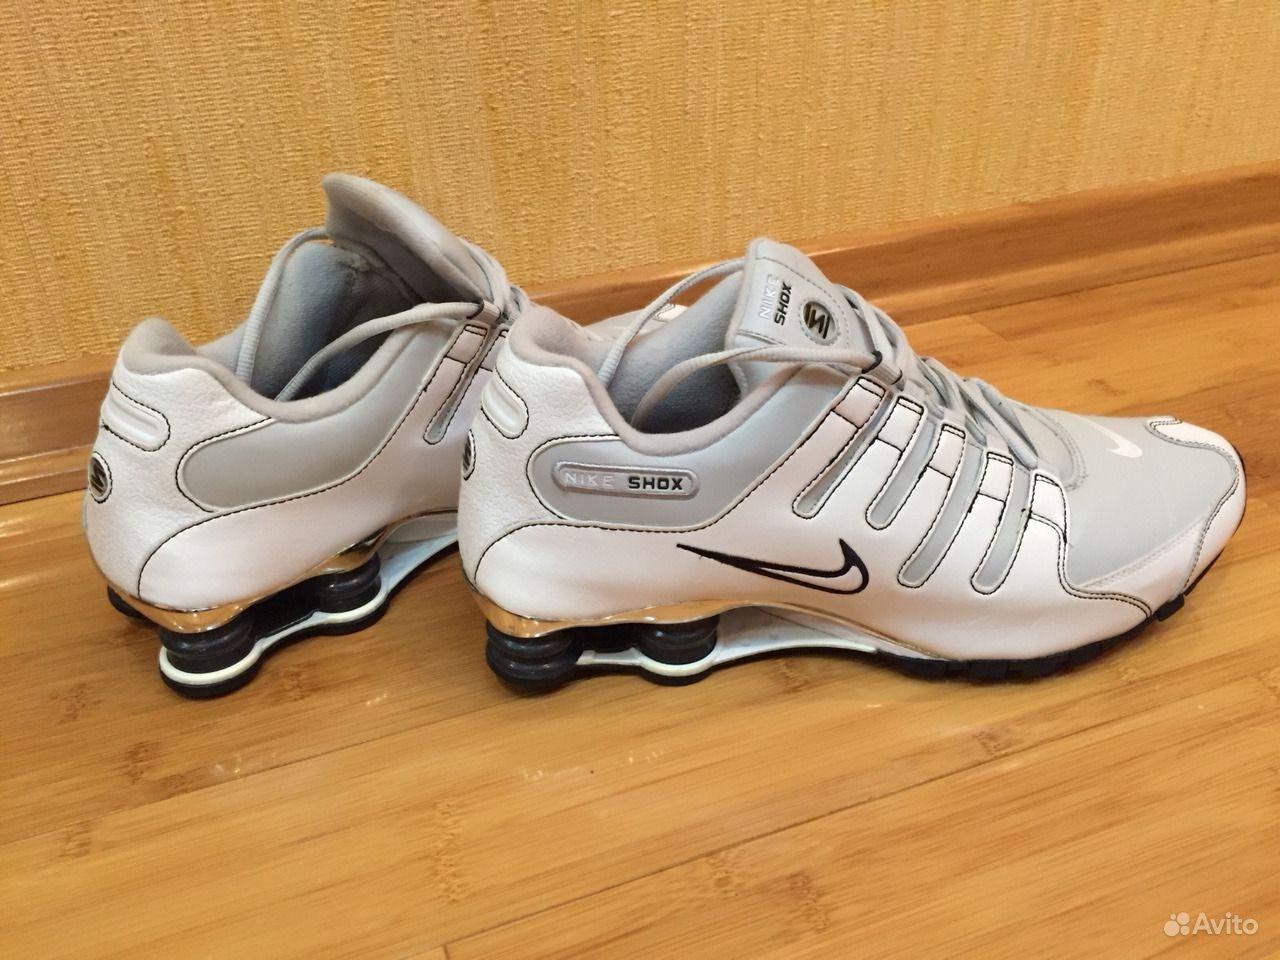 fbeae4b5 Кроссовки Nike Shox р.44 Кожа.Новые | Festima.Ru - Мониторинг объявлений